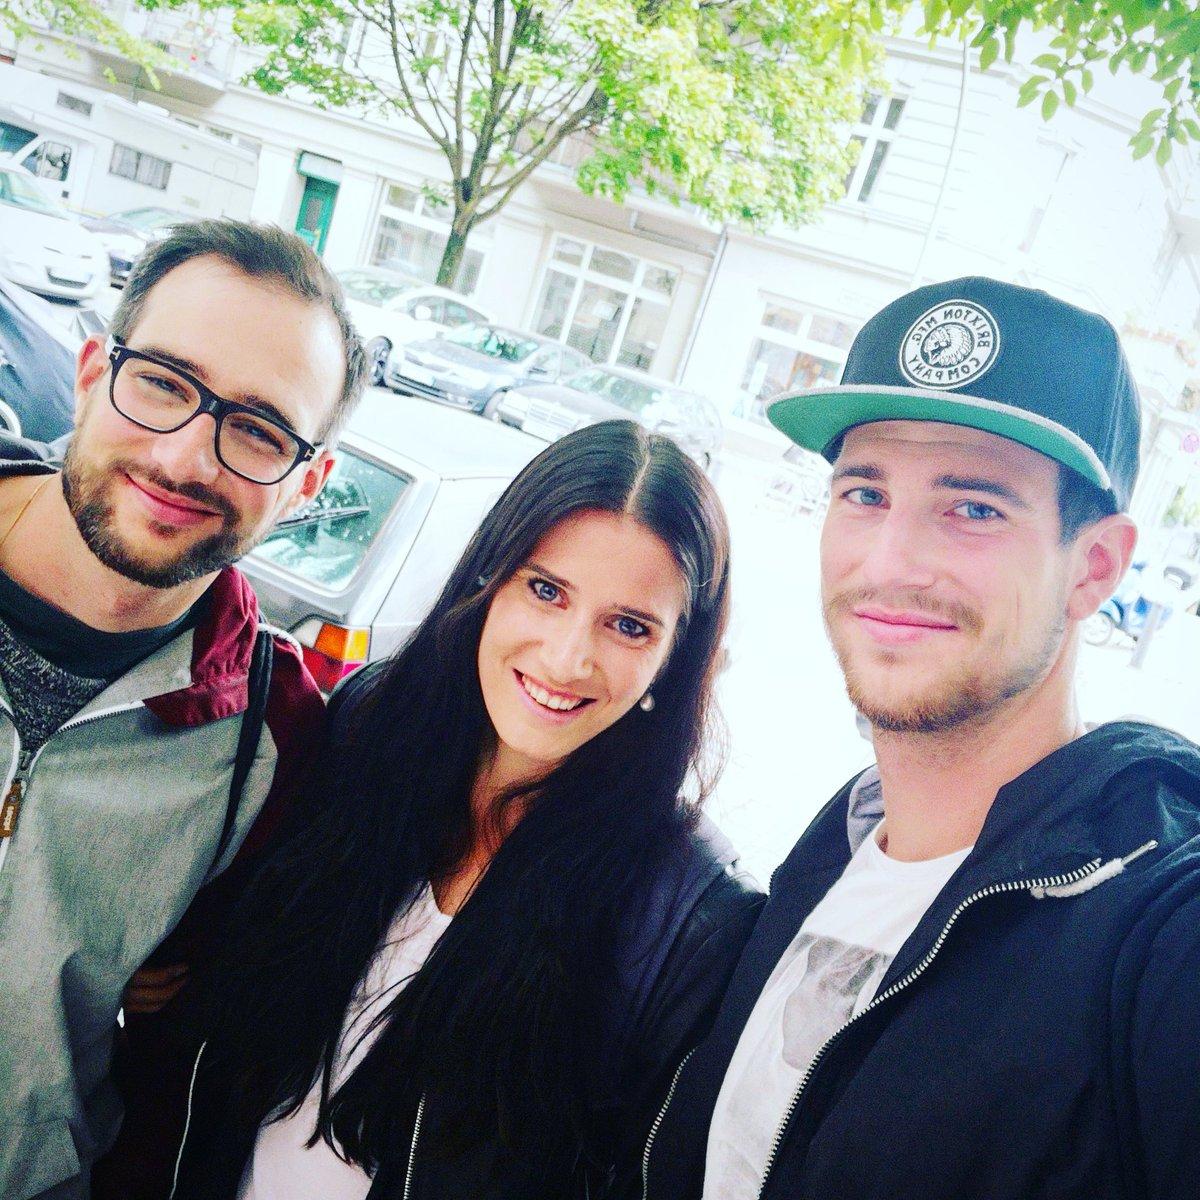 😍FAMILY😍 * * * * #brothers #familytime #berlin #happymonday #backtowork